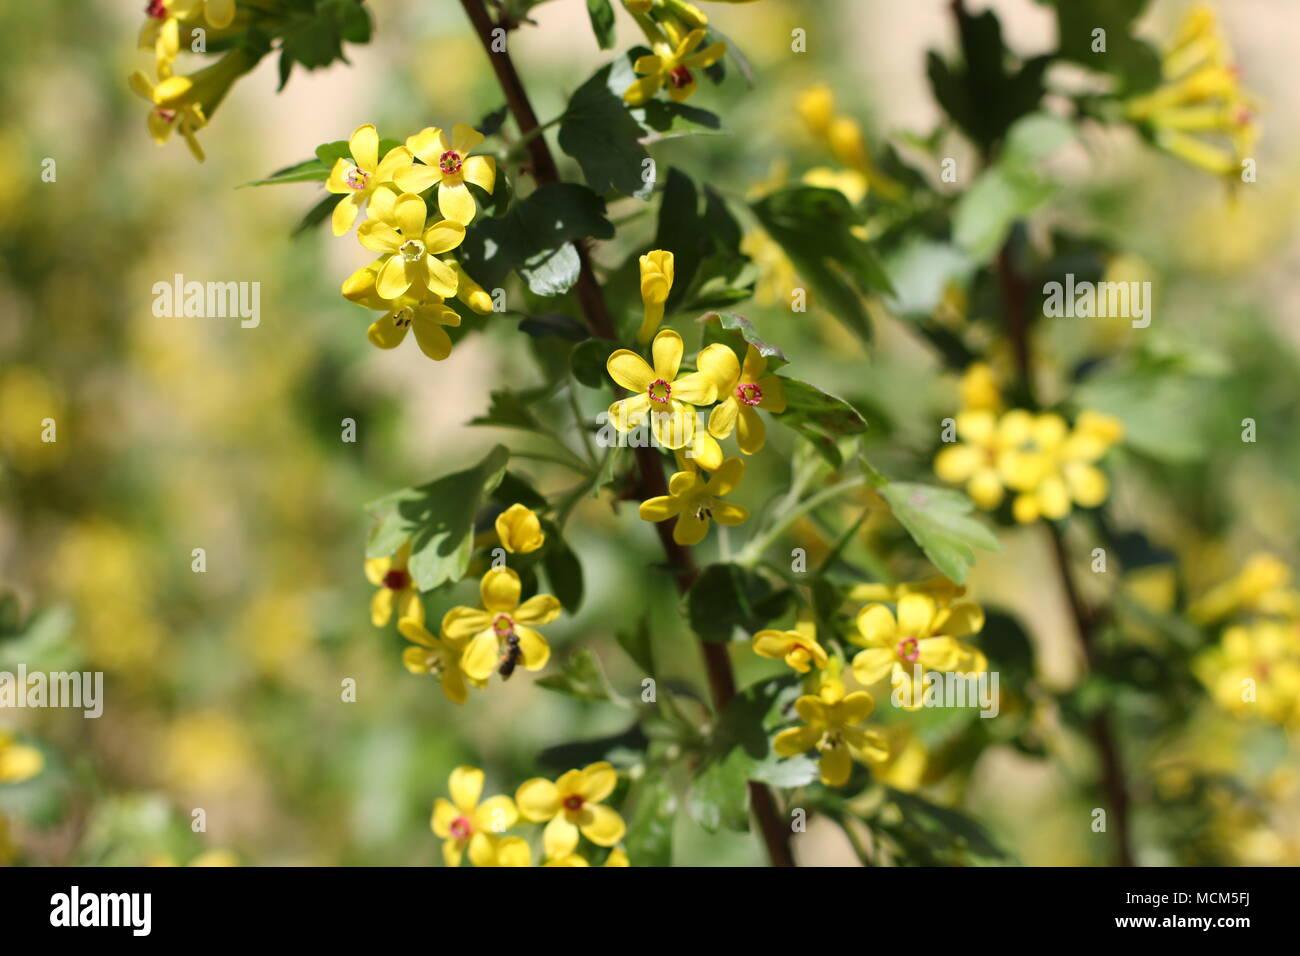 Fleurs Jaune D Or De Cassis Ribes Aureum Photo Stock Alamy